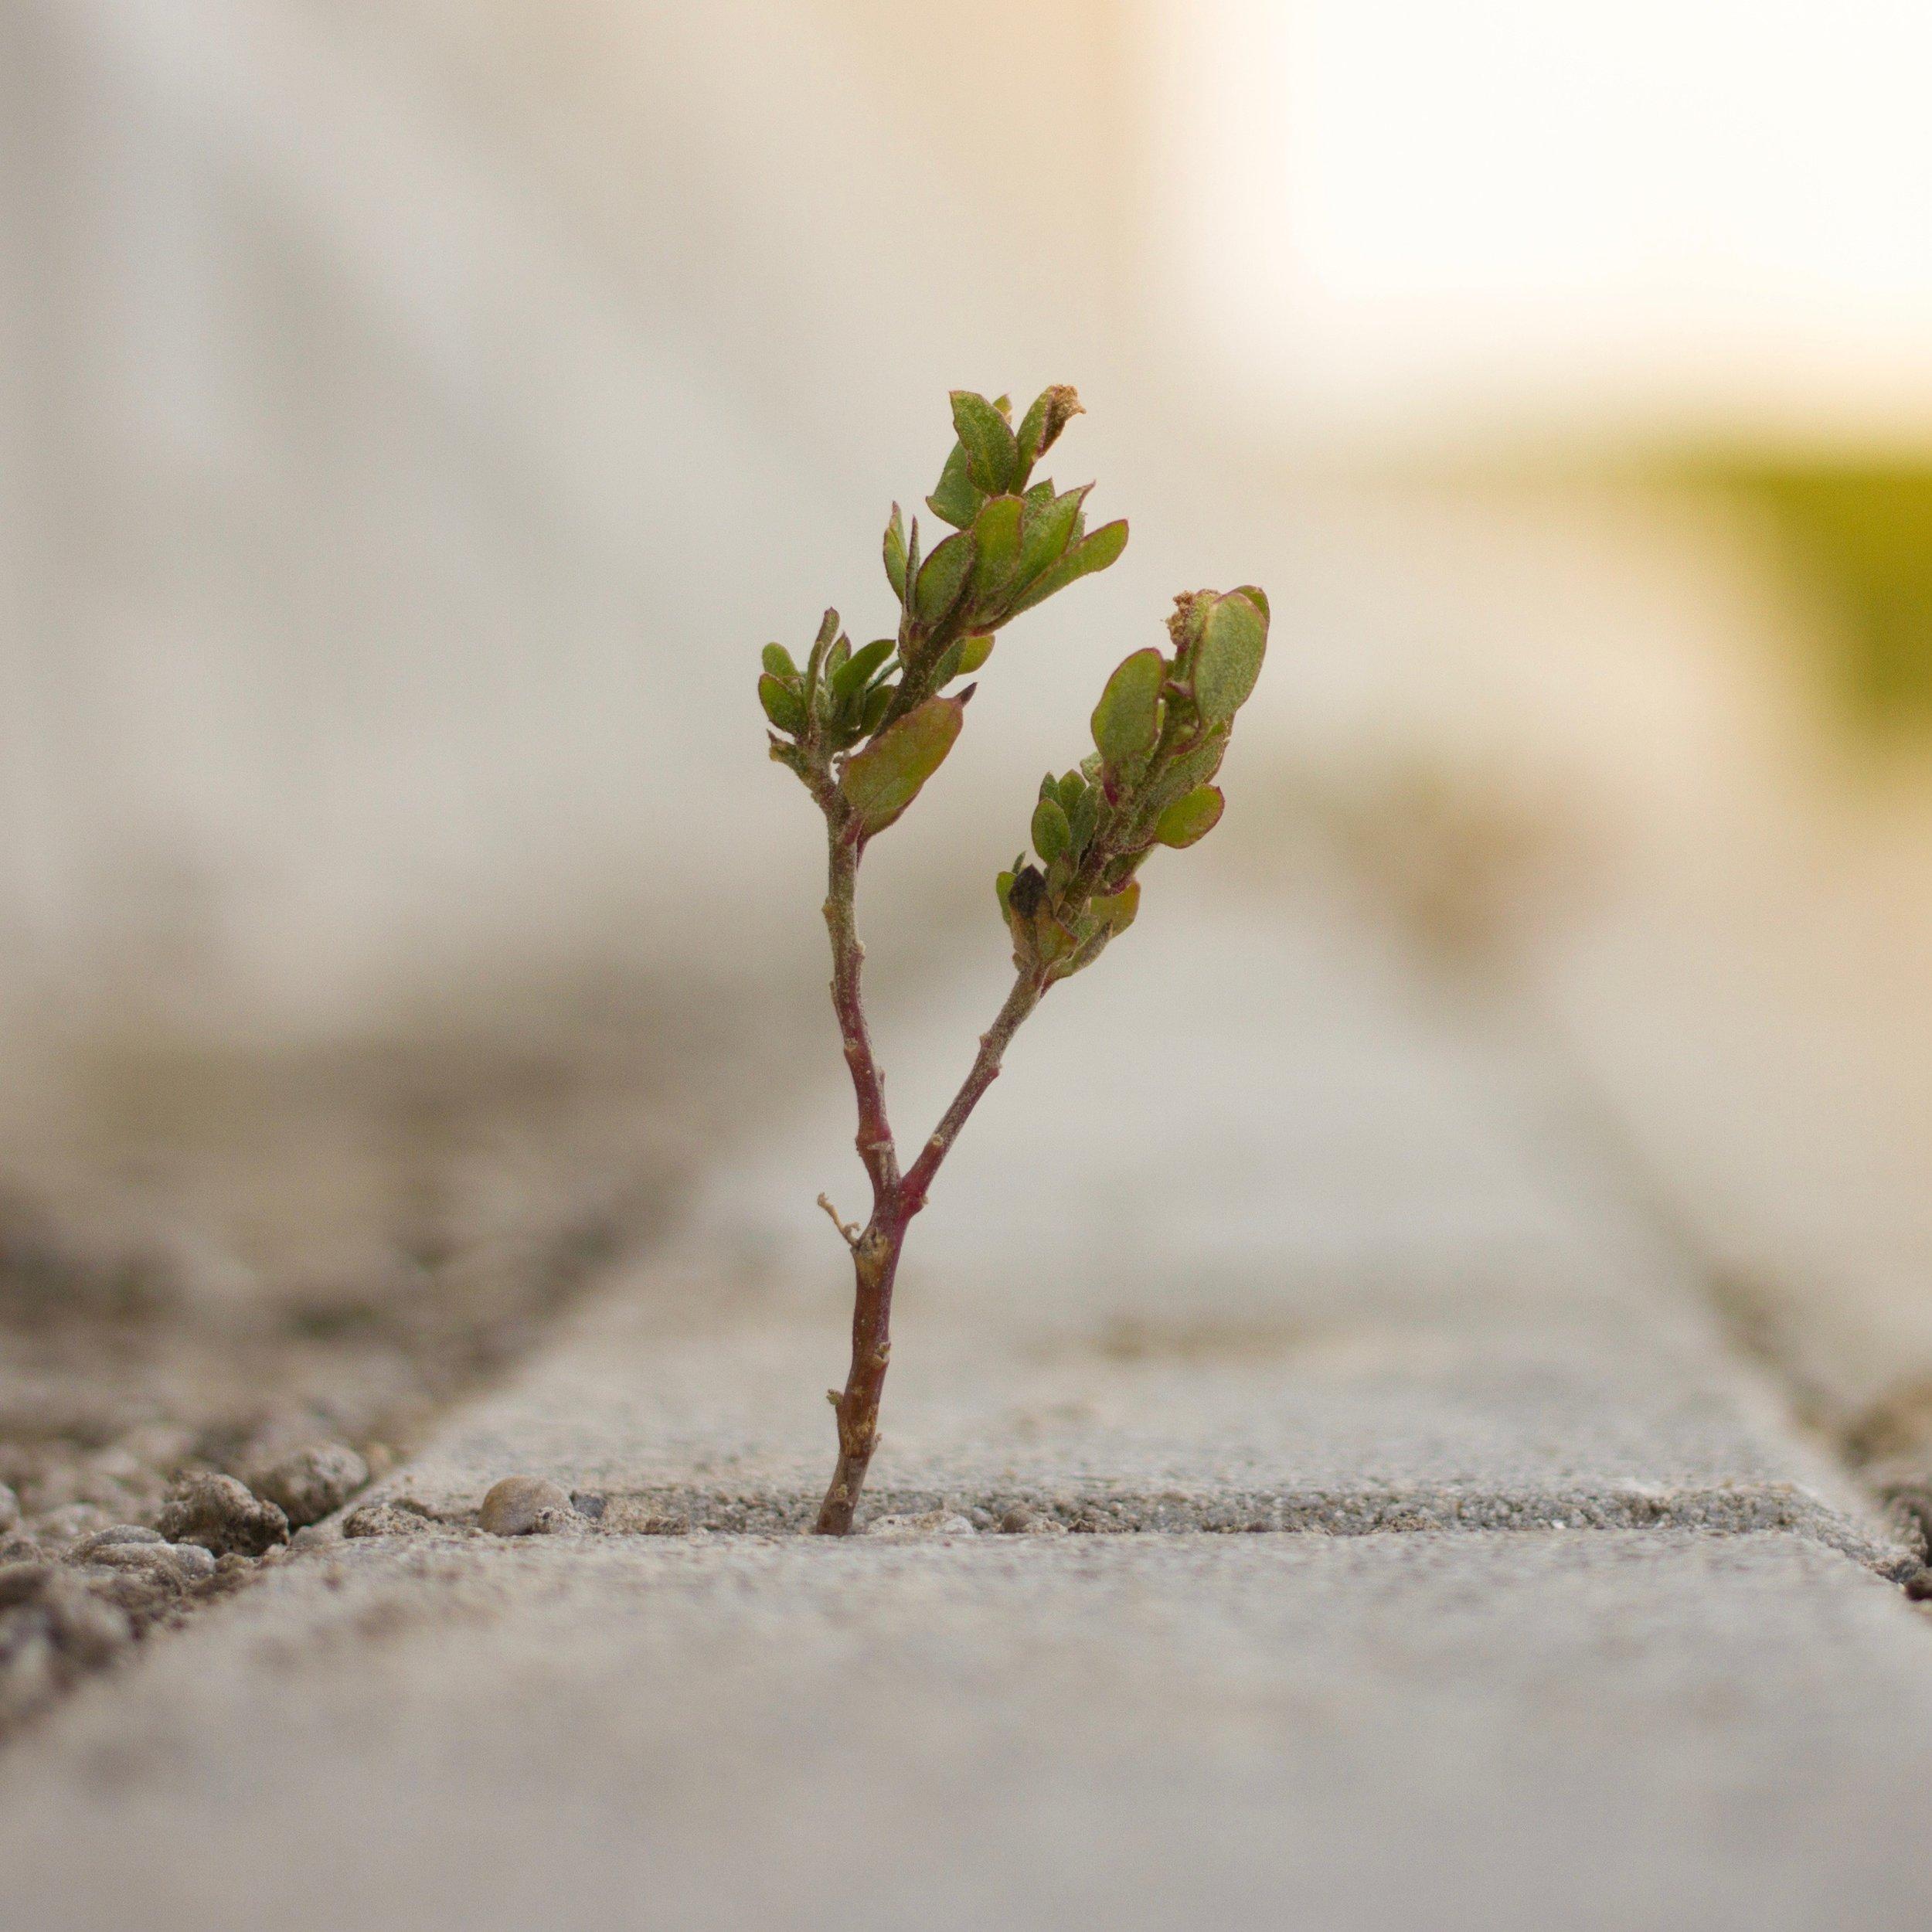 Grow - tight square crop.jpg